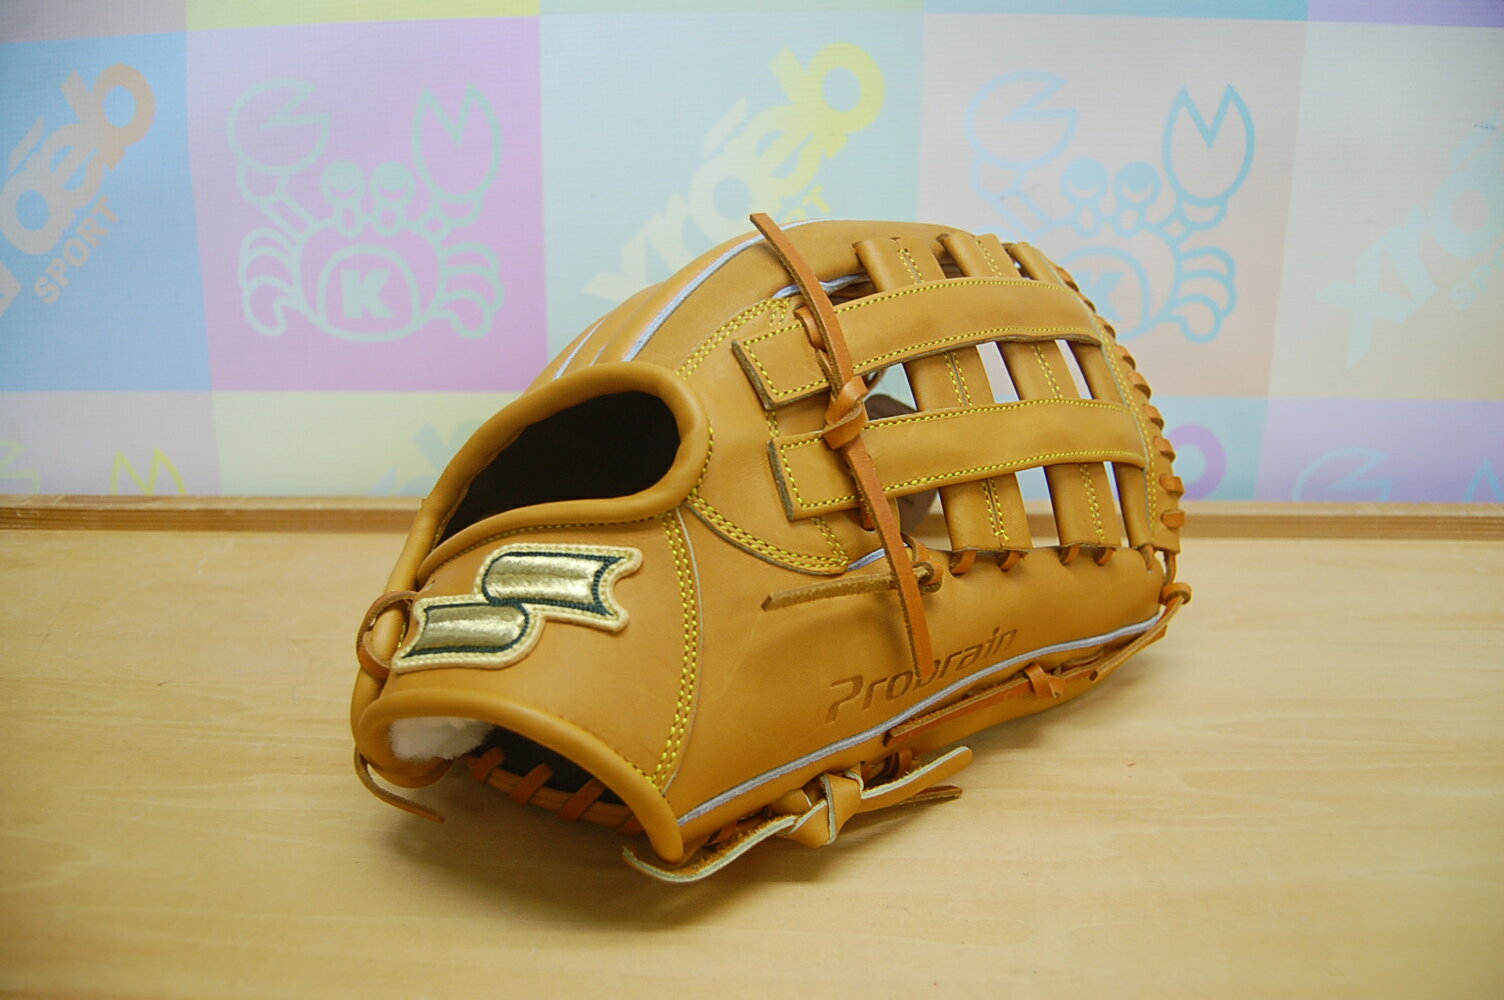 【SALE】SSK硬式グラブ【外野手用】 エスエスケイ/プロブレイン PHX77 (高校野球/硬式グローブ)